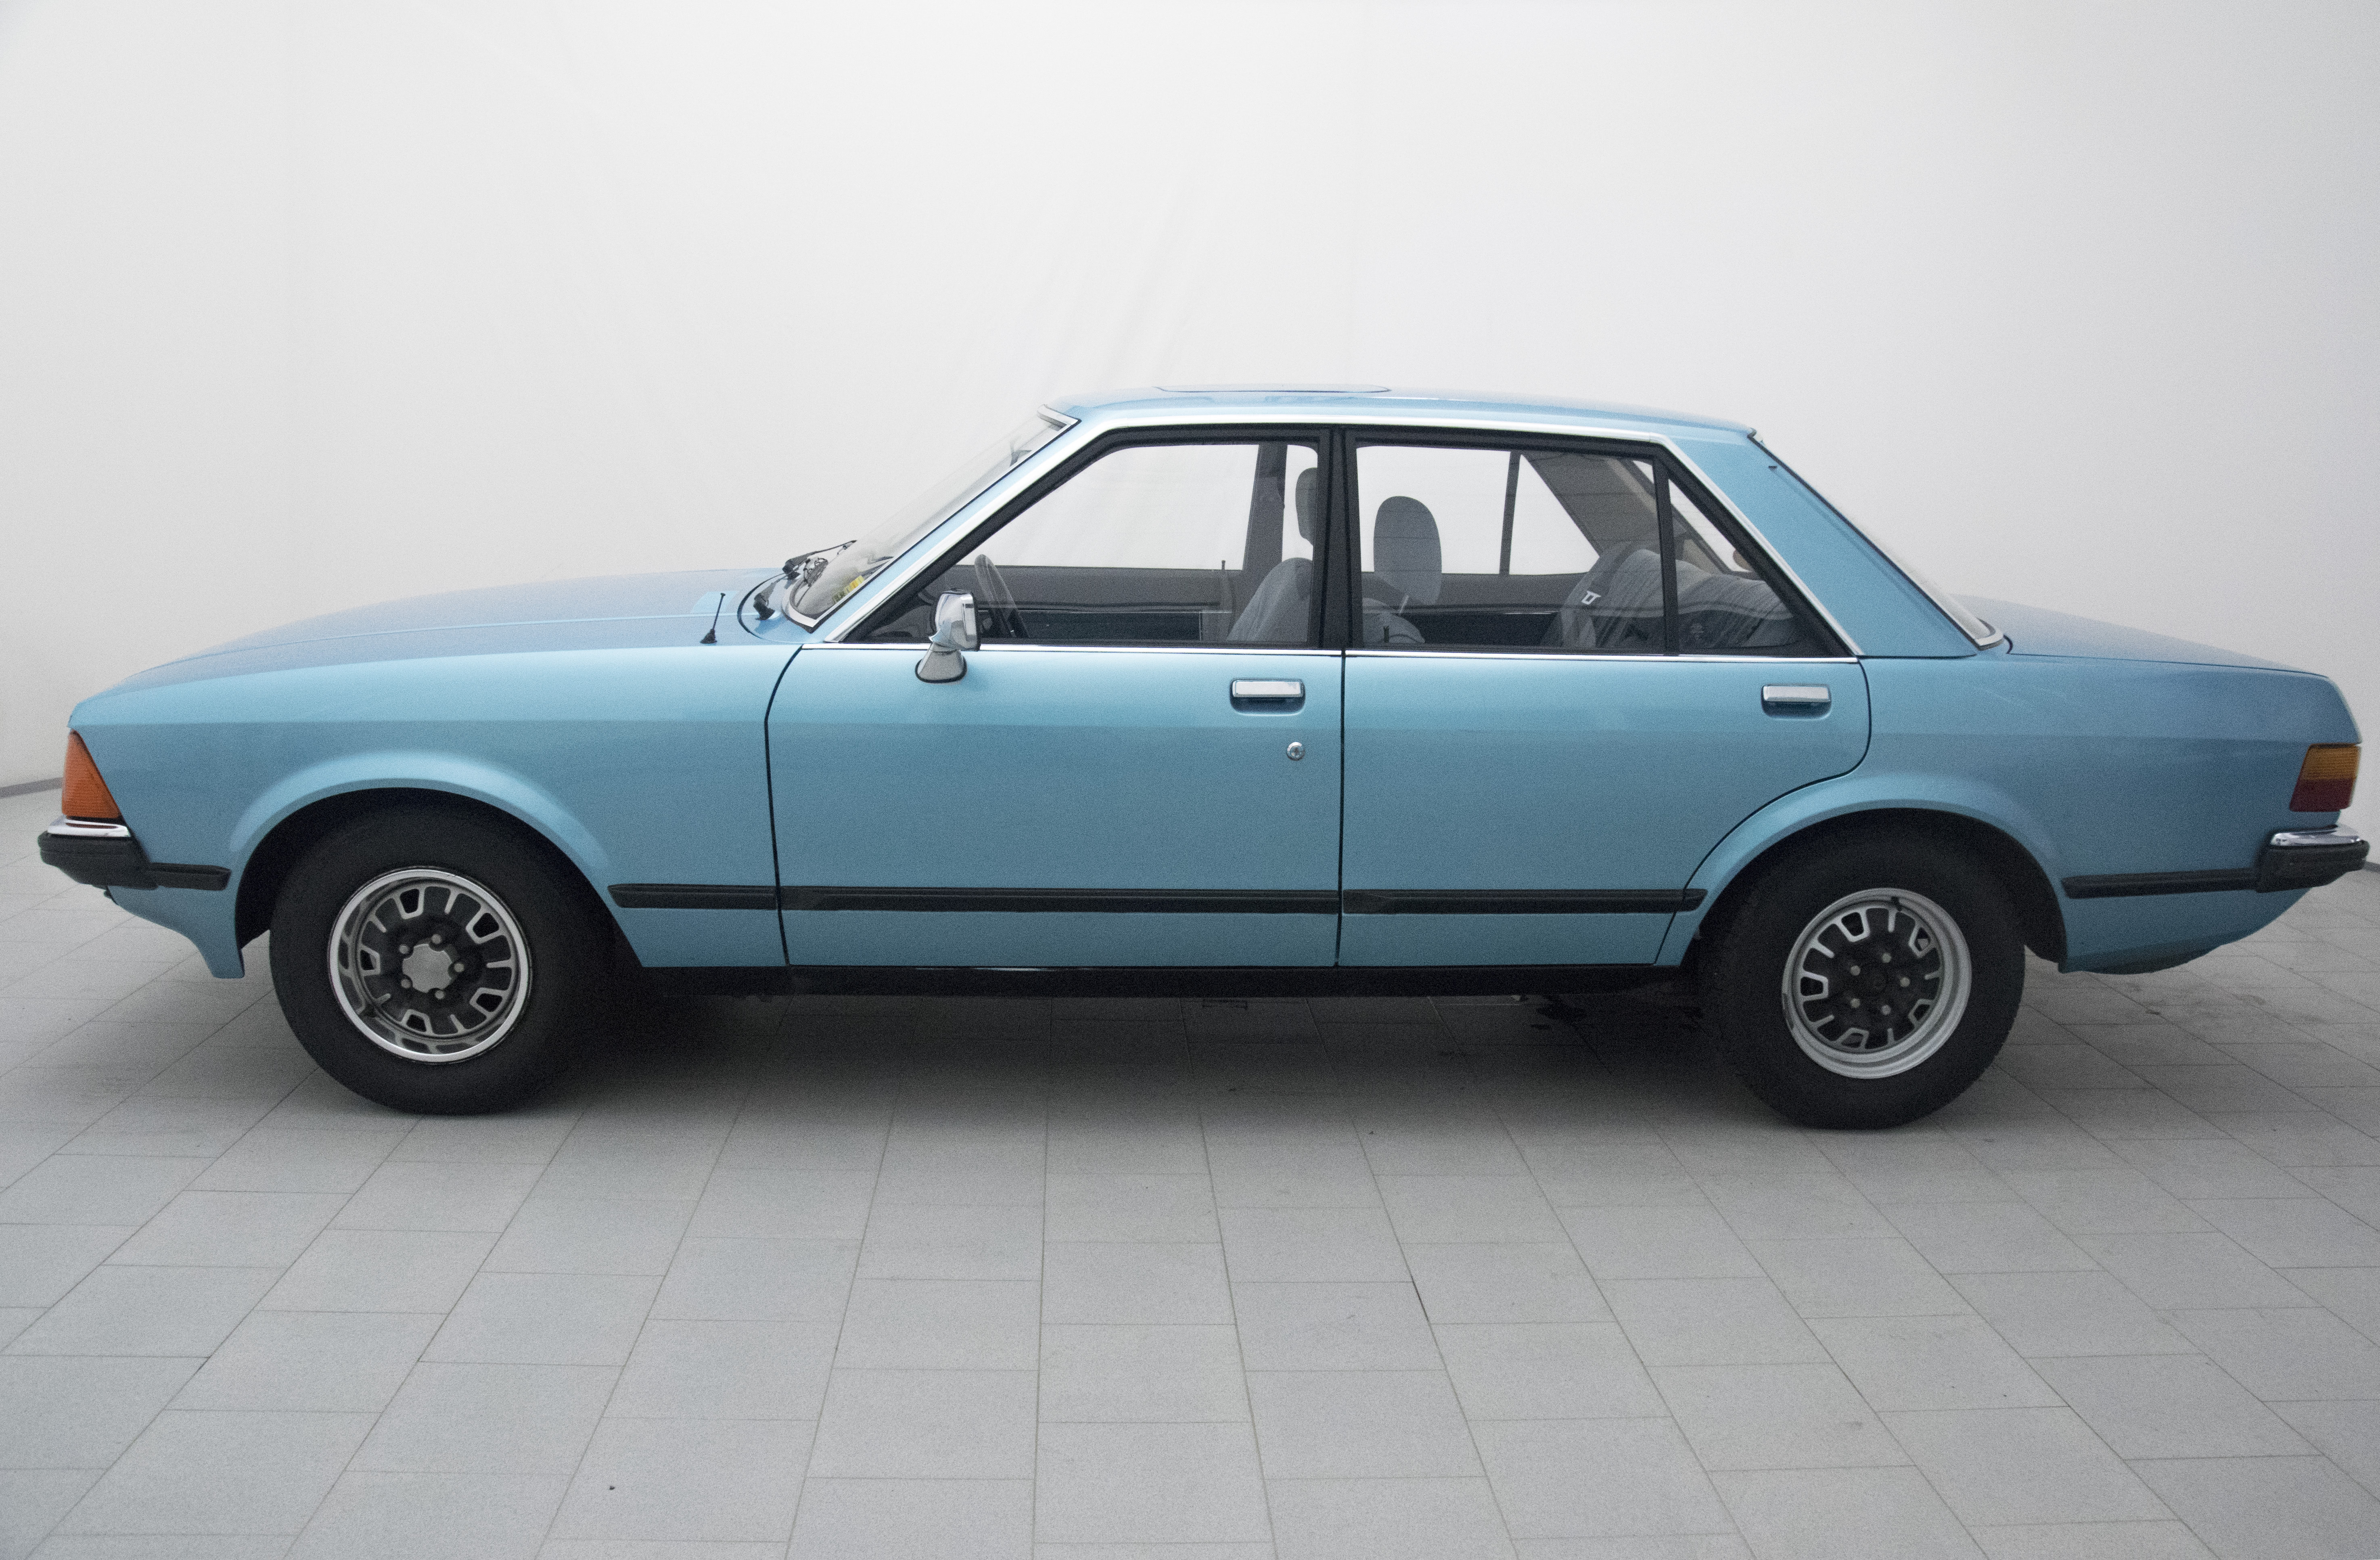 Ford Granada 2 3 Gl Classicbid